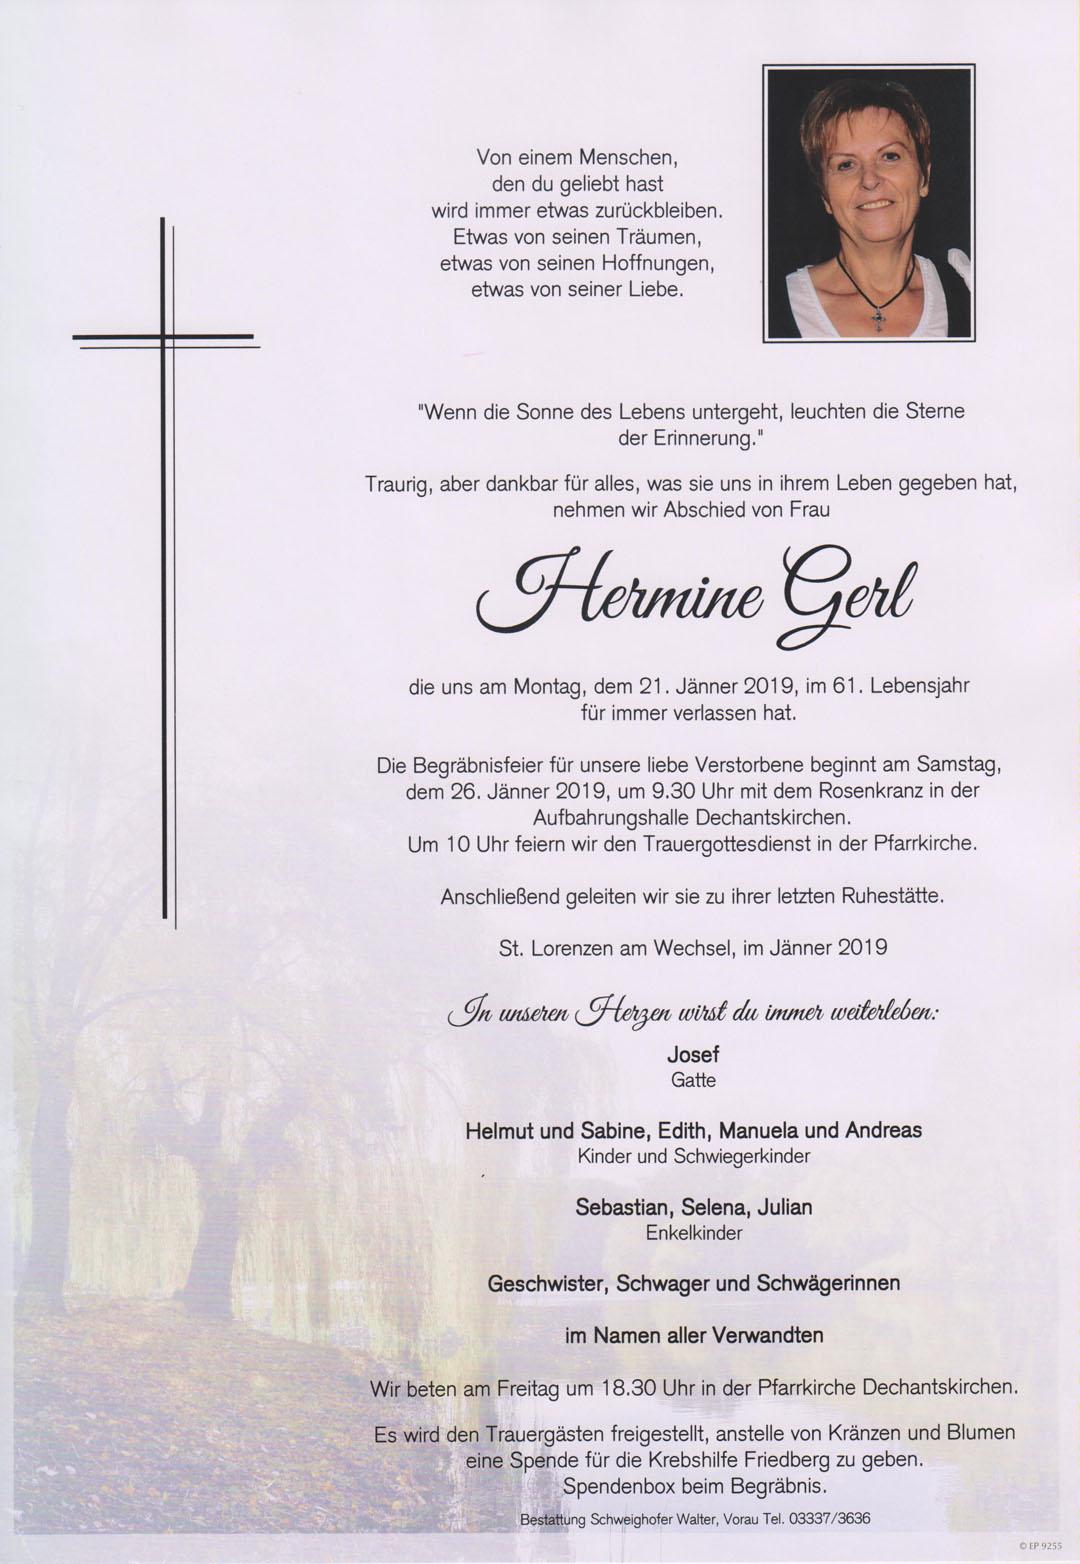 Hermine Gerl